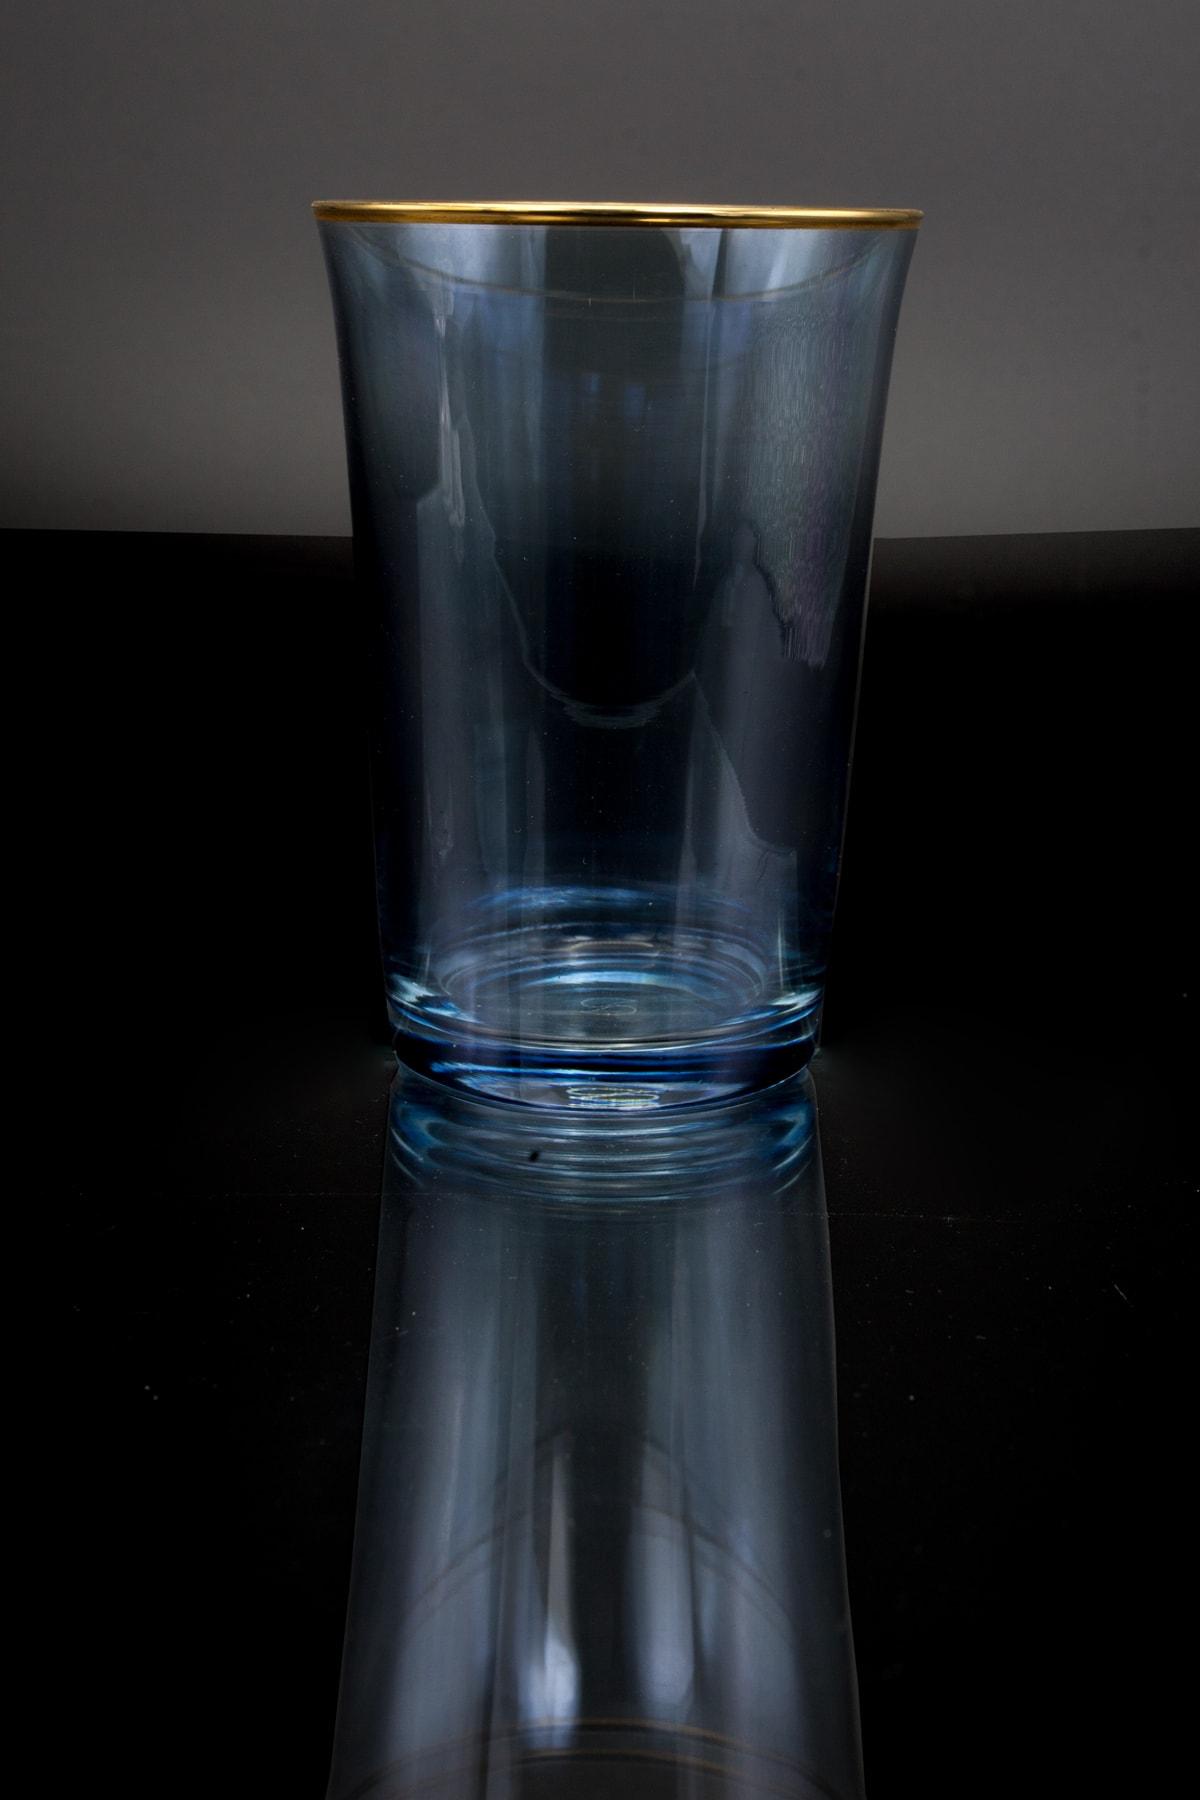 Paşabahçe 6 Parça Mavi Altın Su Bardağı 420022 1